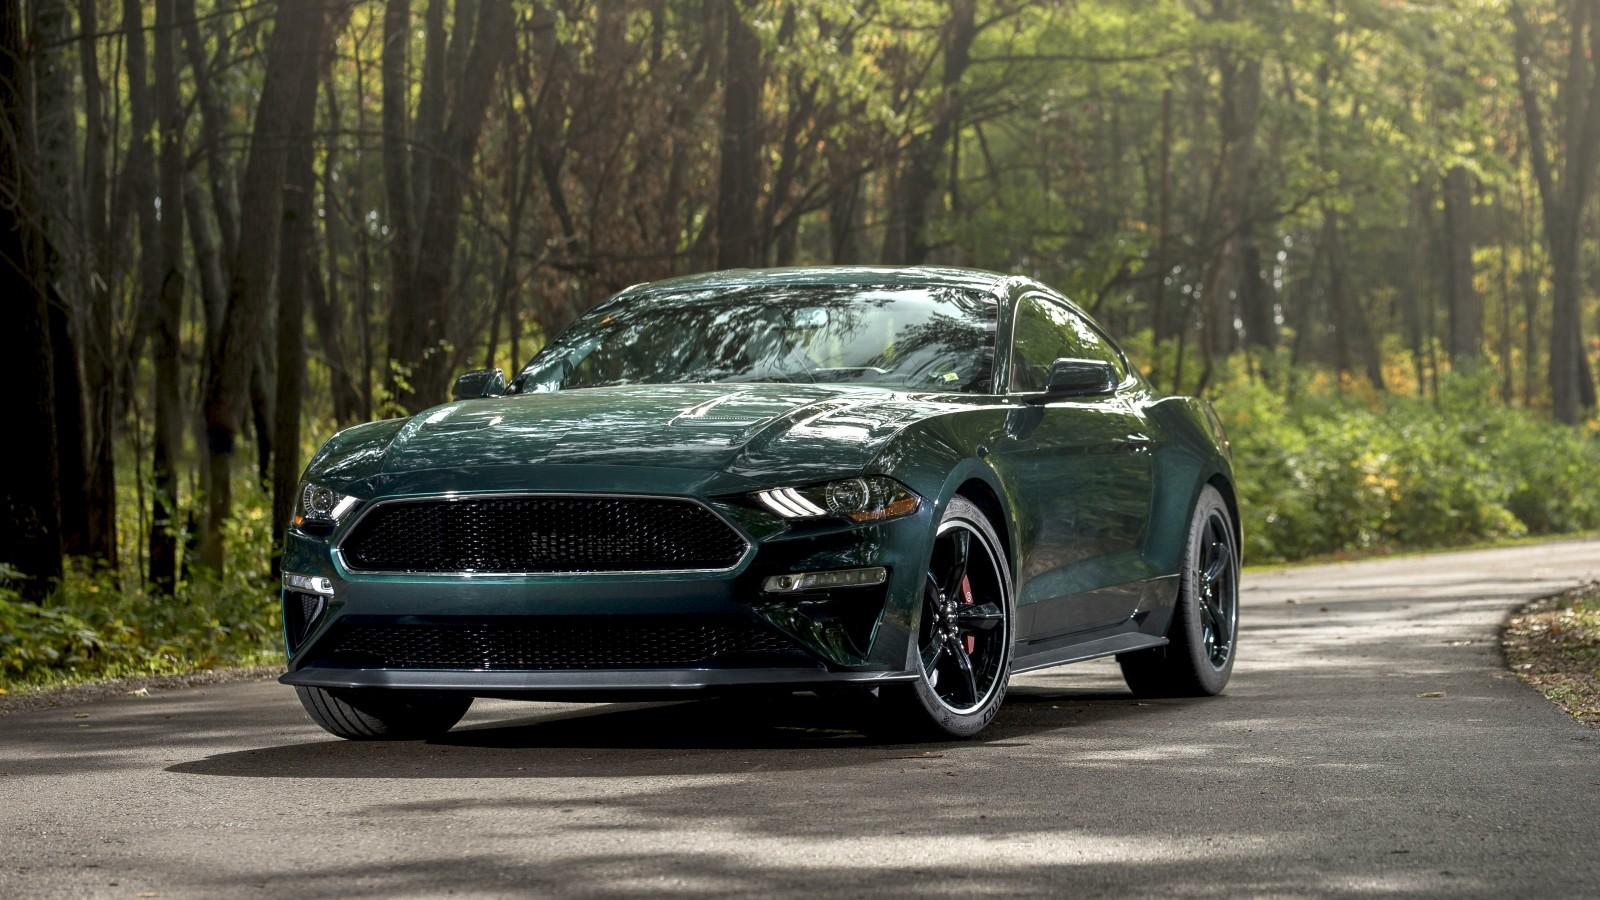 2019 Ford Mustang Bullitt 5K Wallpaper | HD Car Wallpapers ...